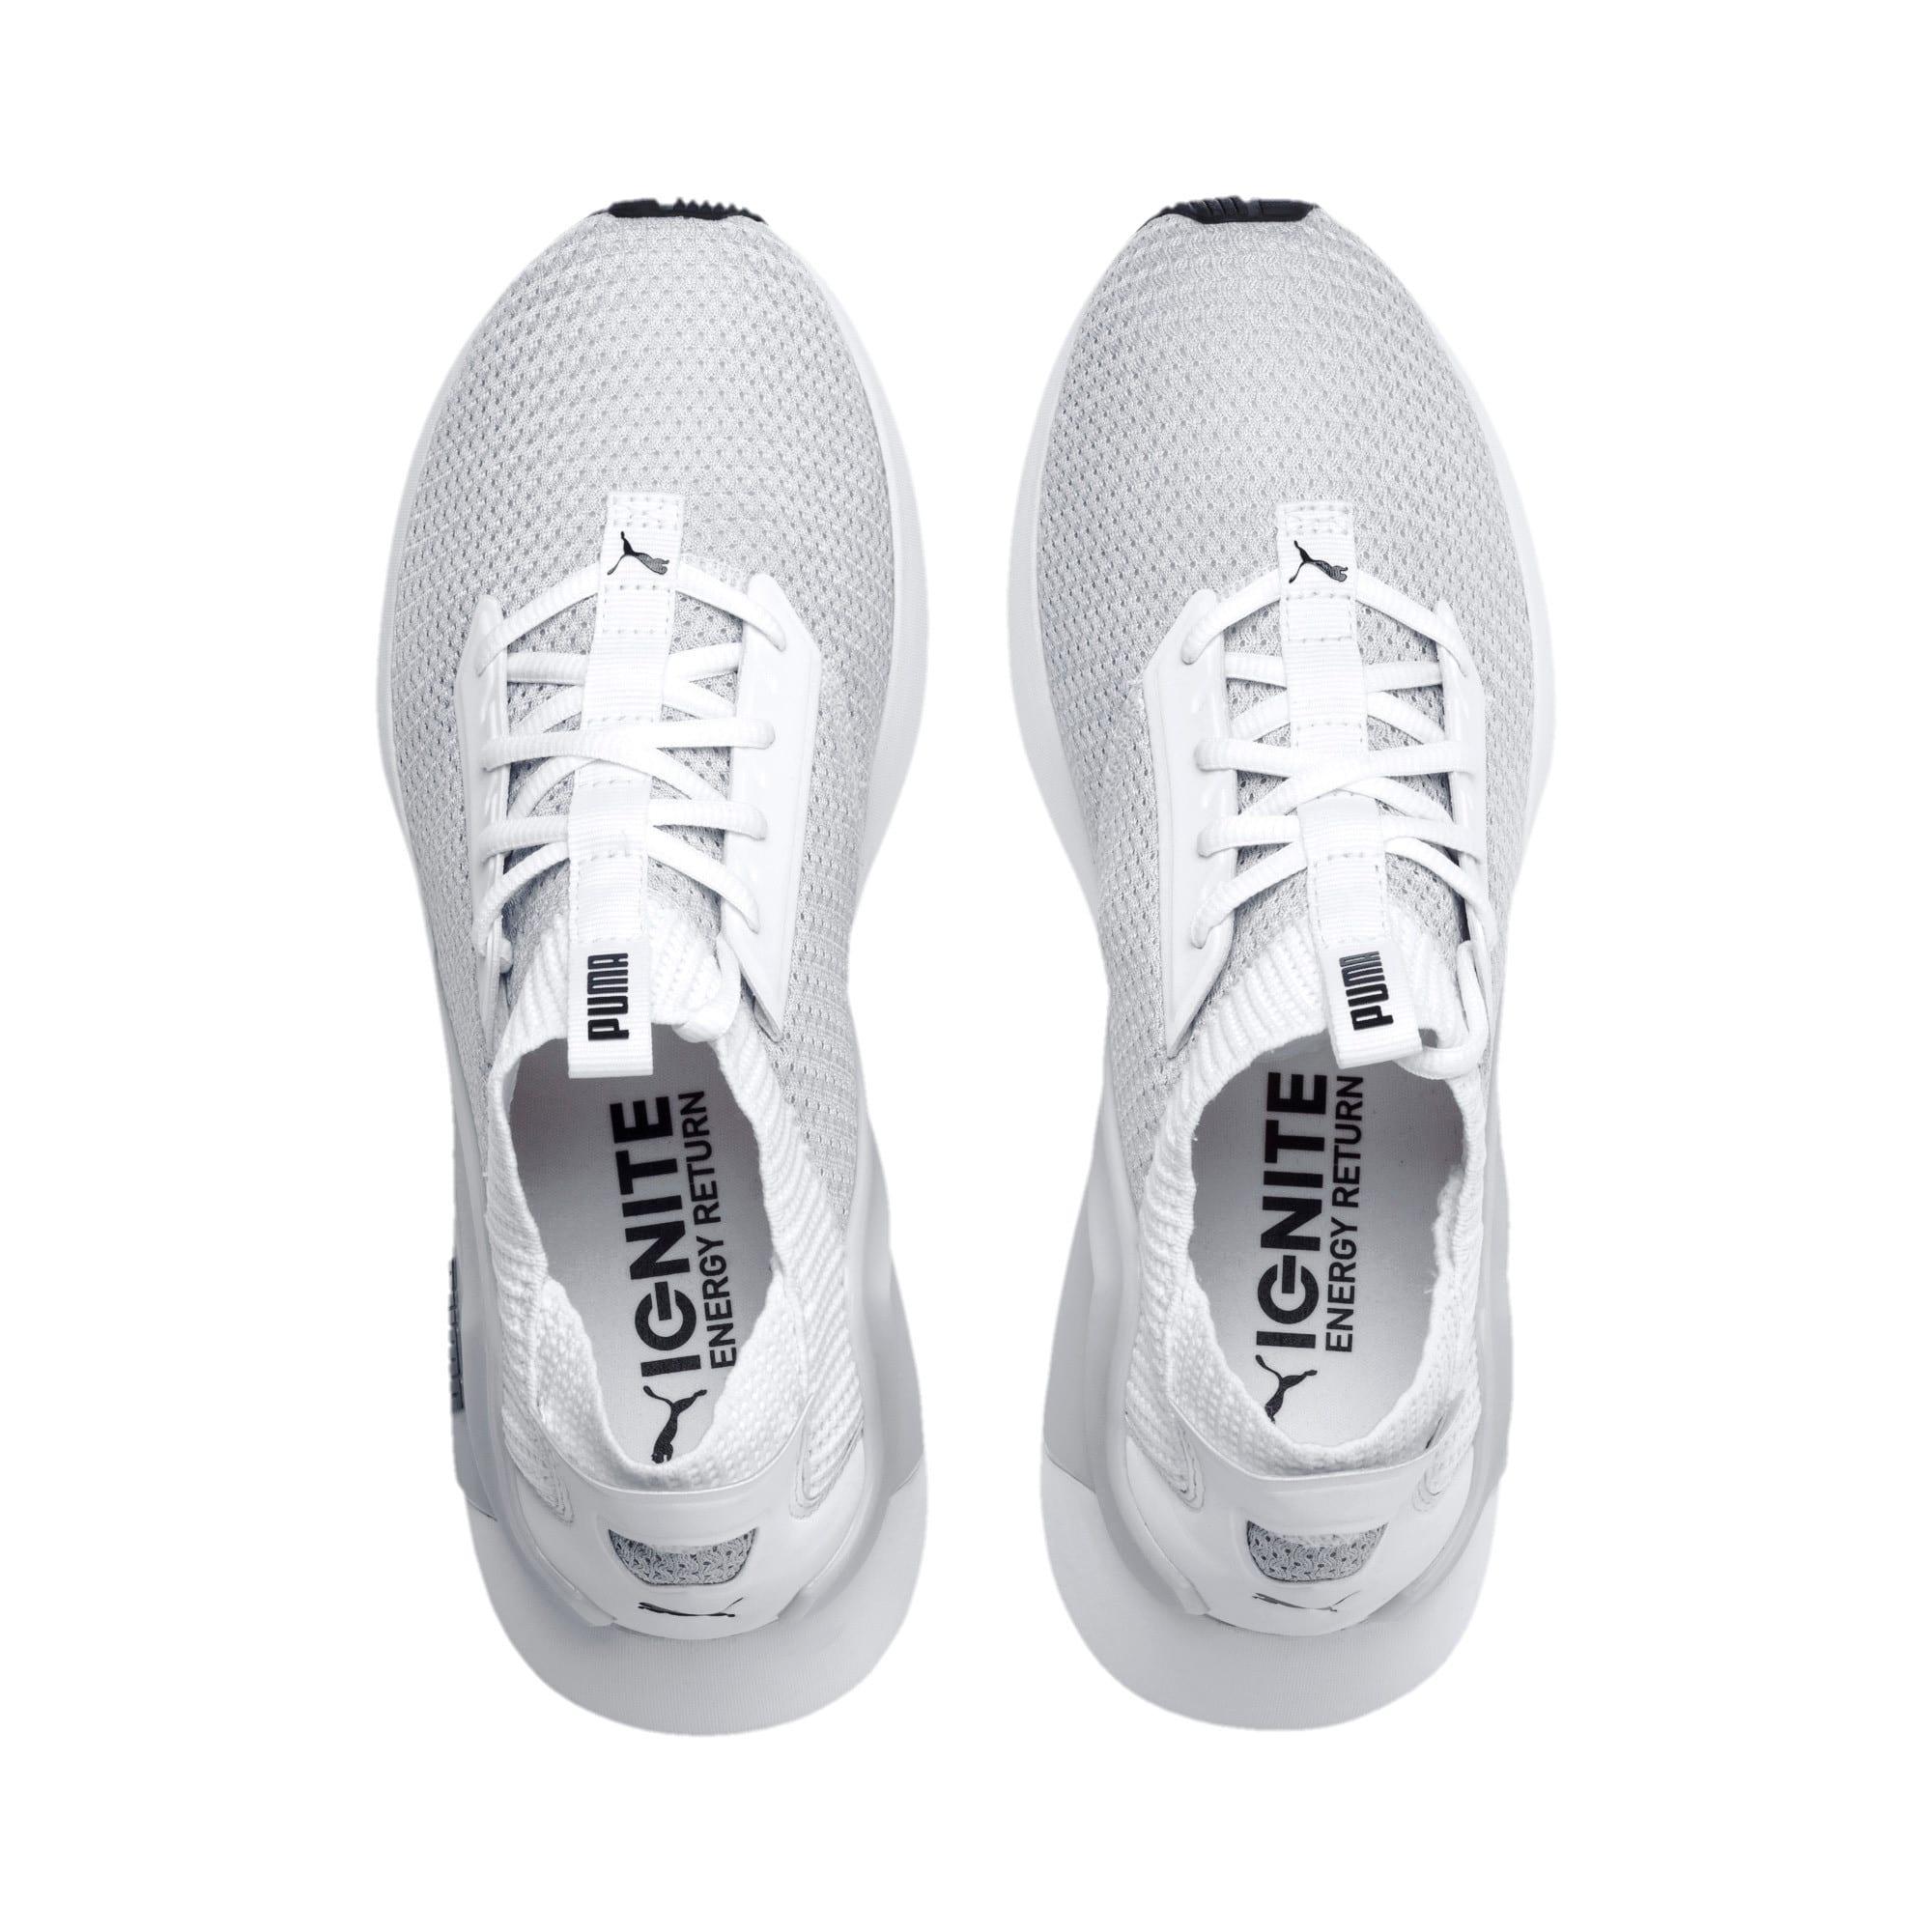 Thumbnail 6 of Rogue Men's Running Shoes, Puma White-Puma Black, medium